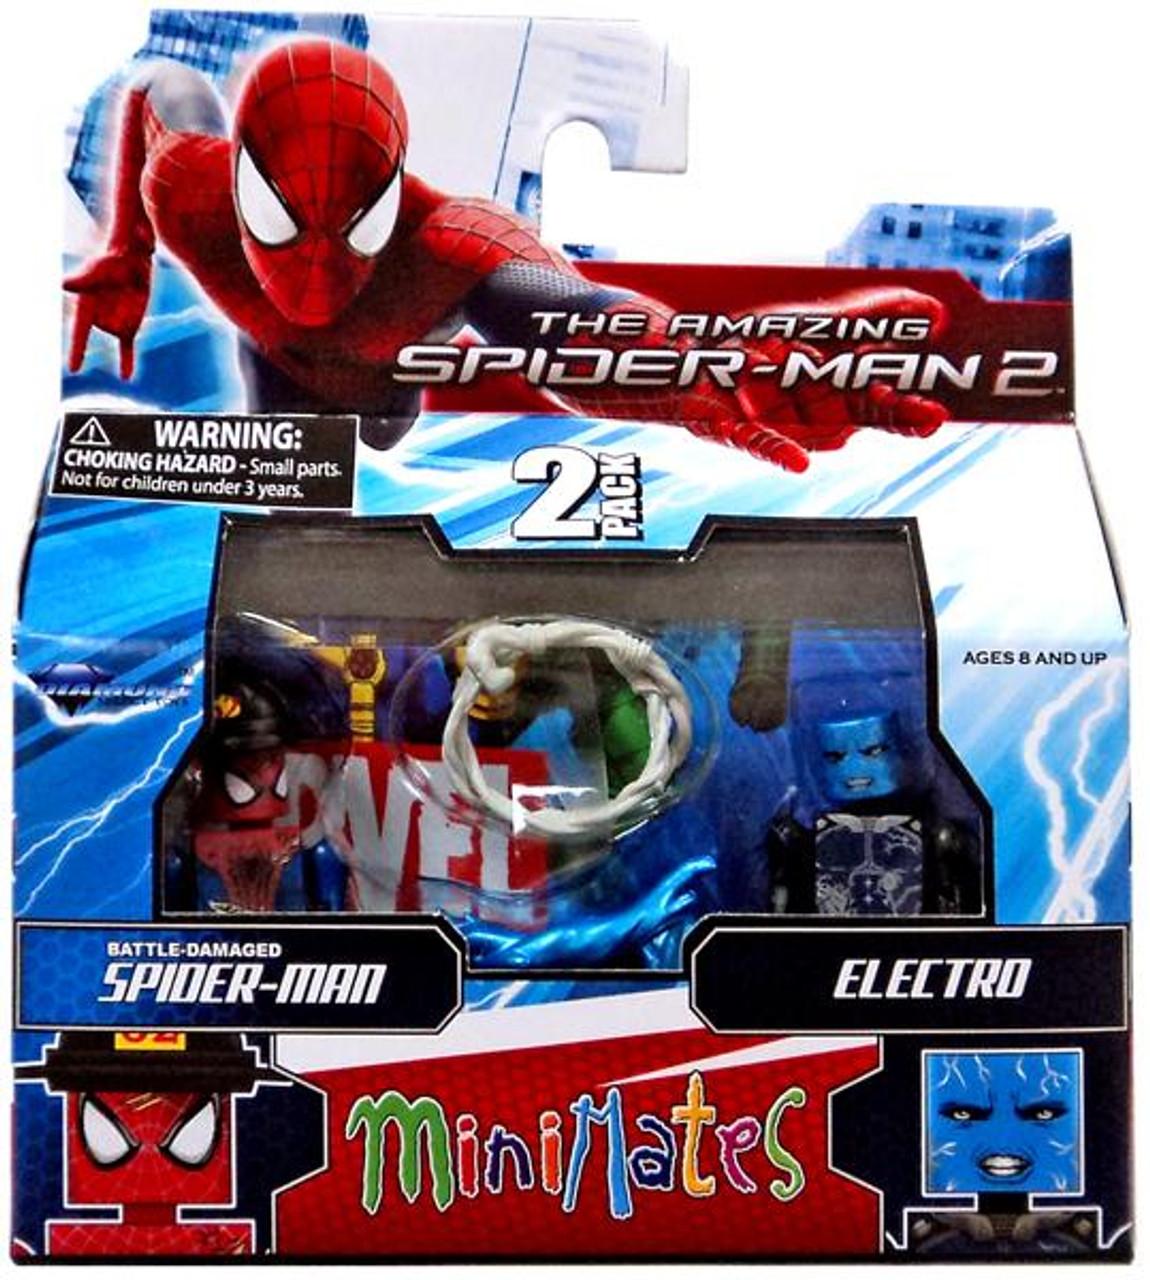 The Amazing Spider-Man 2 Minimates Series 56 Battle-Damaged Spider-Man & Electro Minifigure 2-Pack